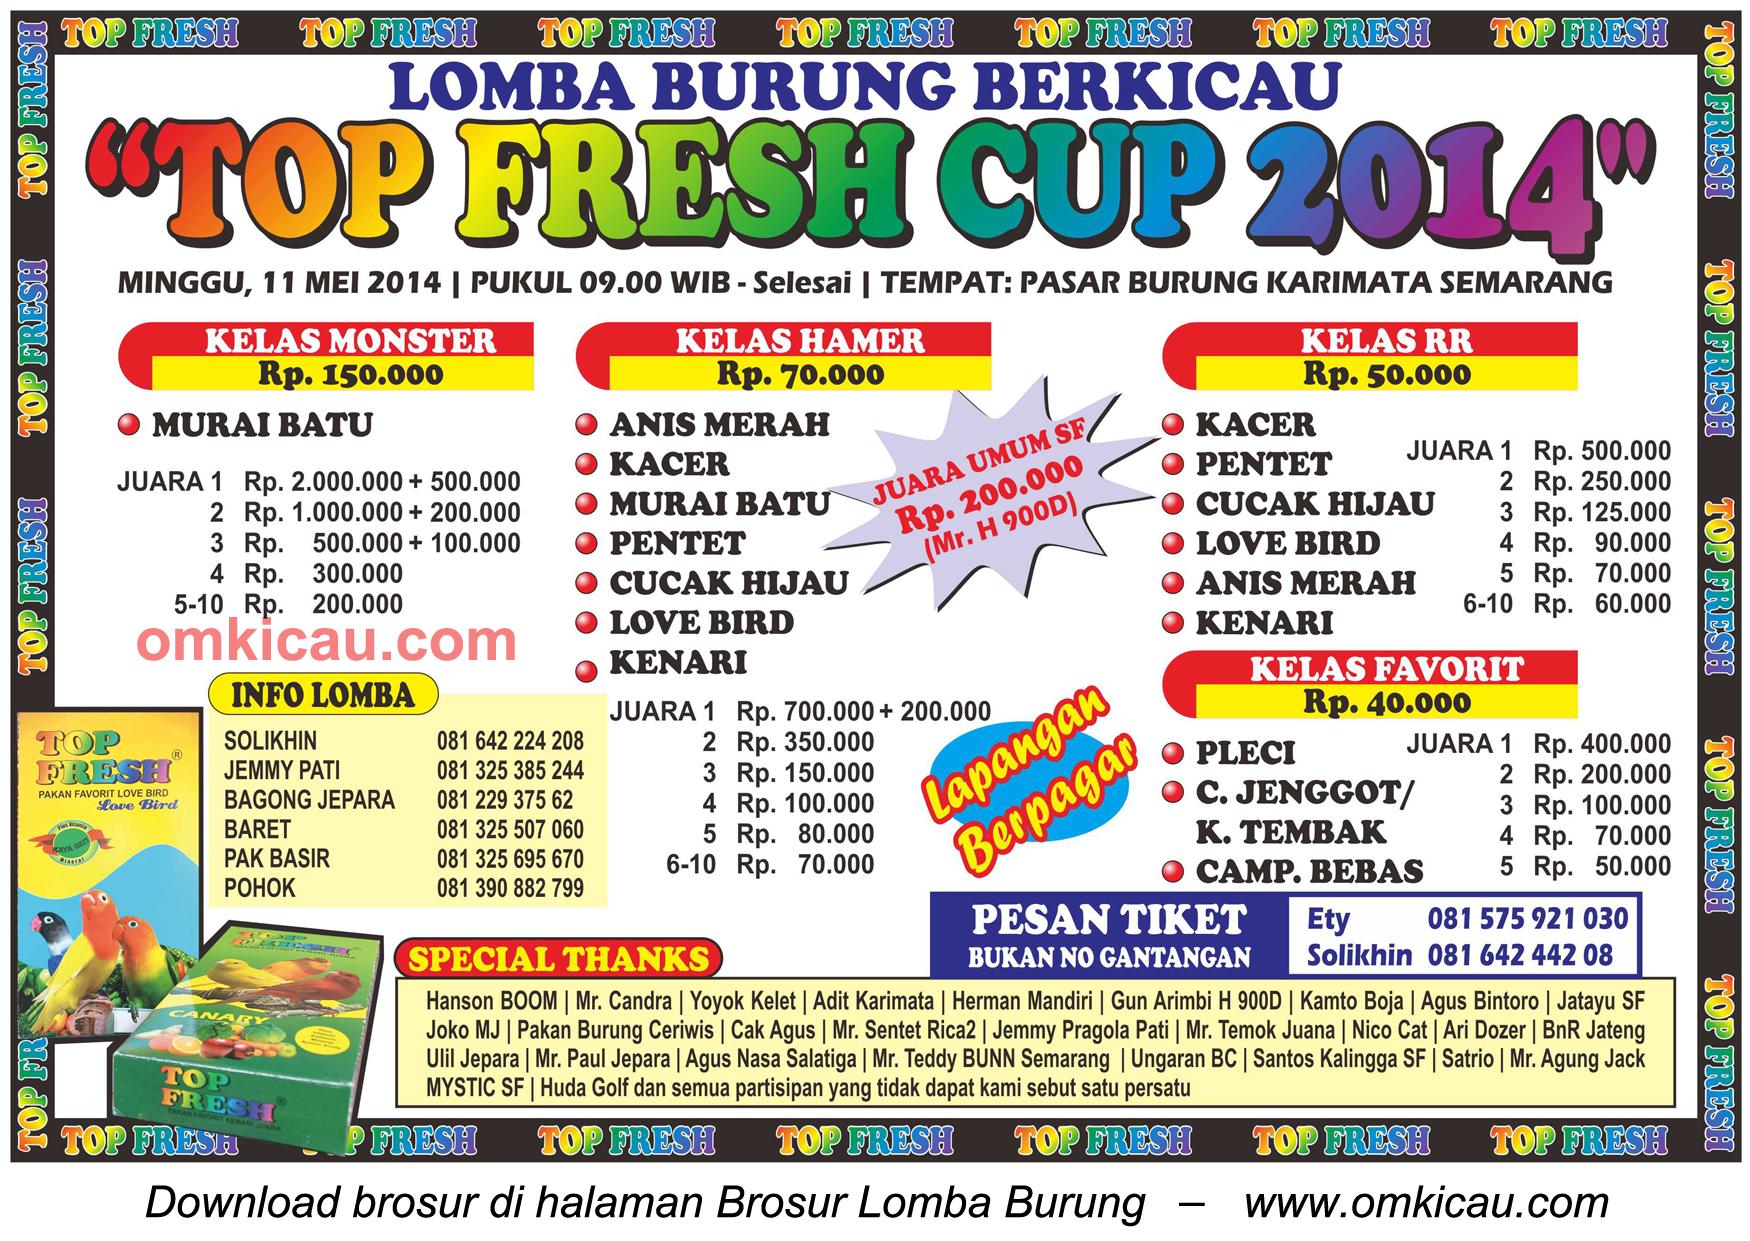 Brosur Lomba Burung Berkicau Top Fresh Cup, Semarang, 11 Mei 2014